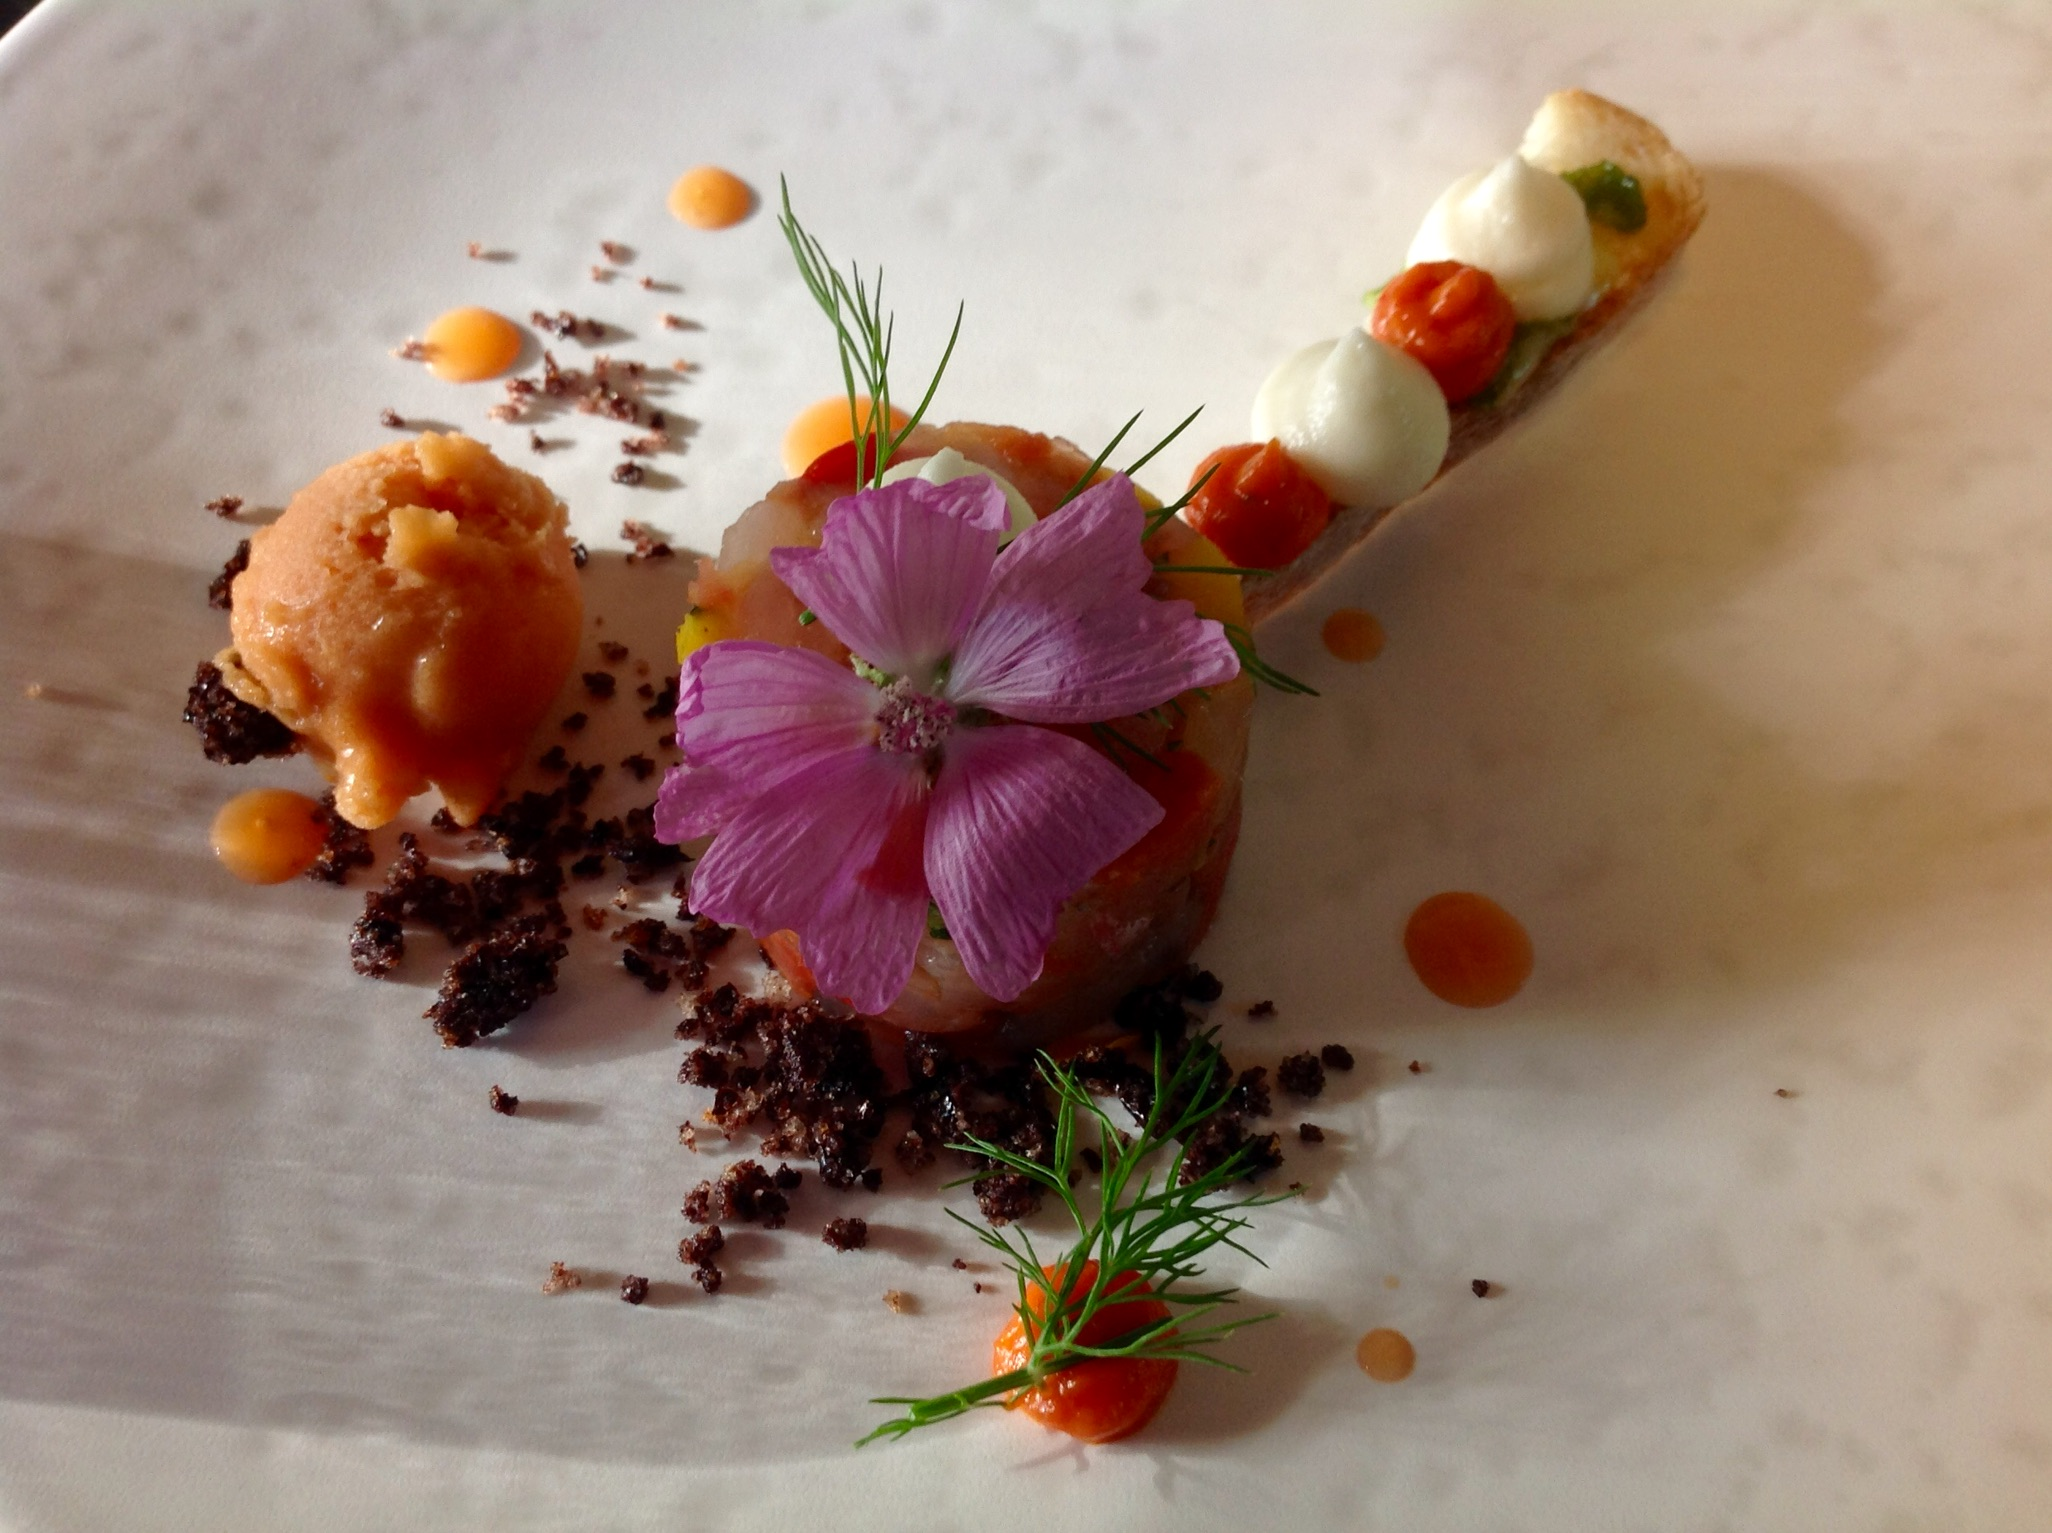 gastronomie-didier-galet-4